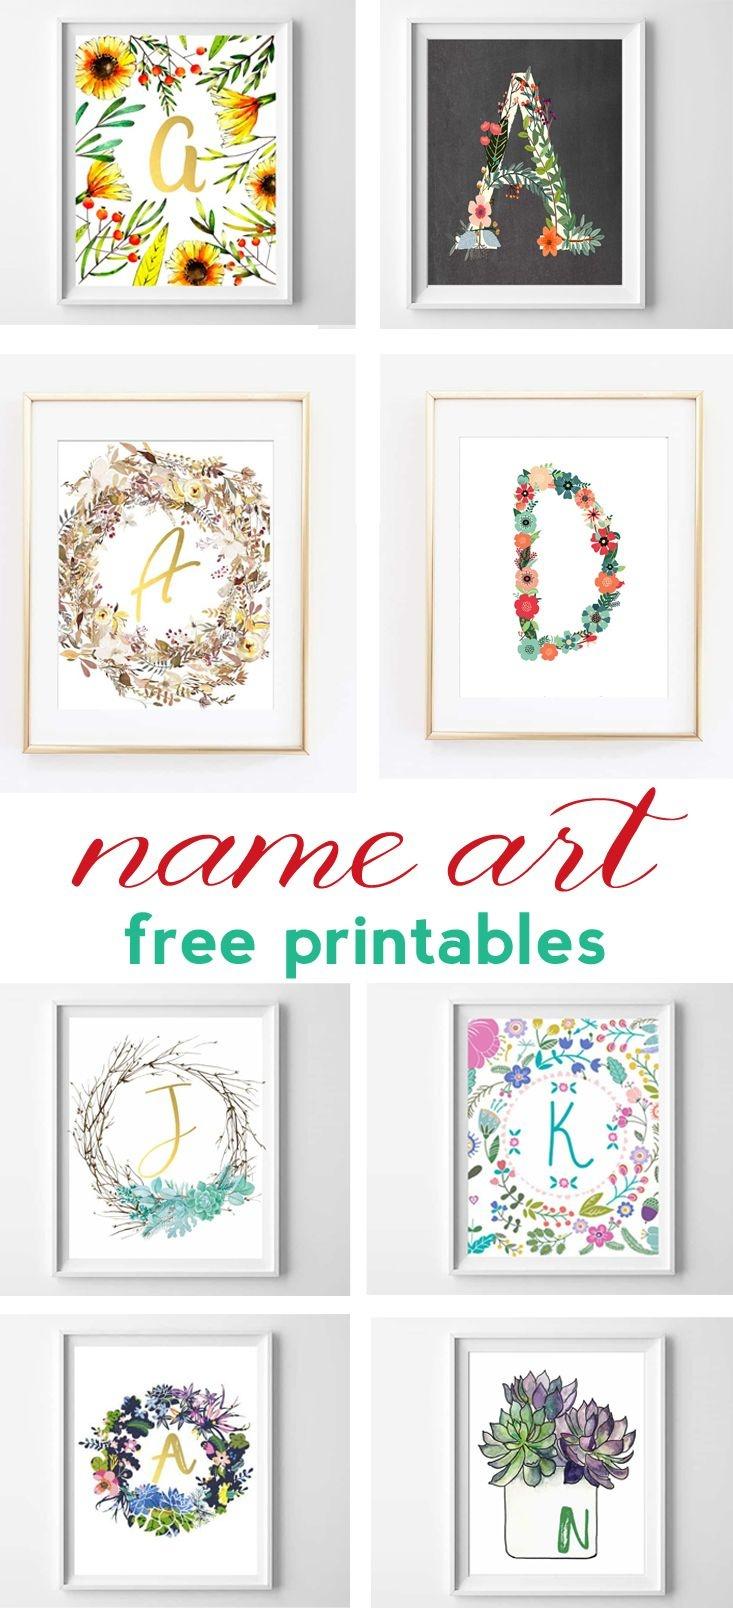 Name Art And Alphabet Printables {Free Printable Art} | Bloggers - Free Printable Photo Letter Art